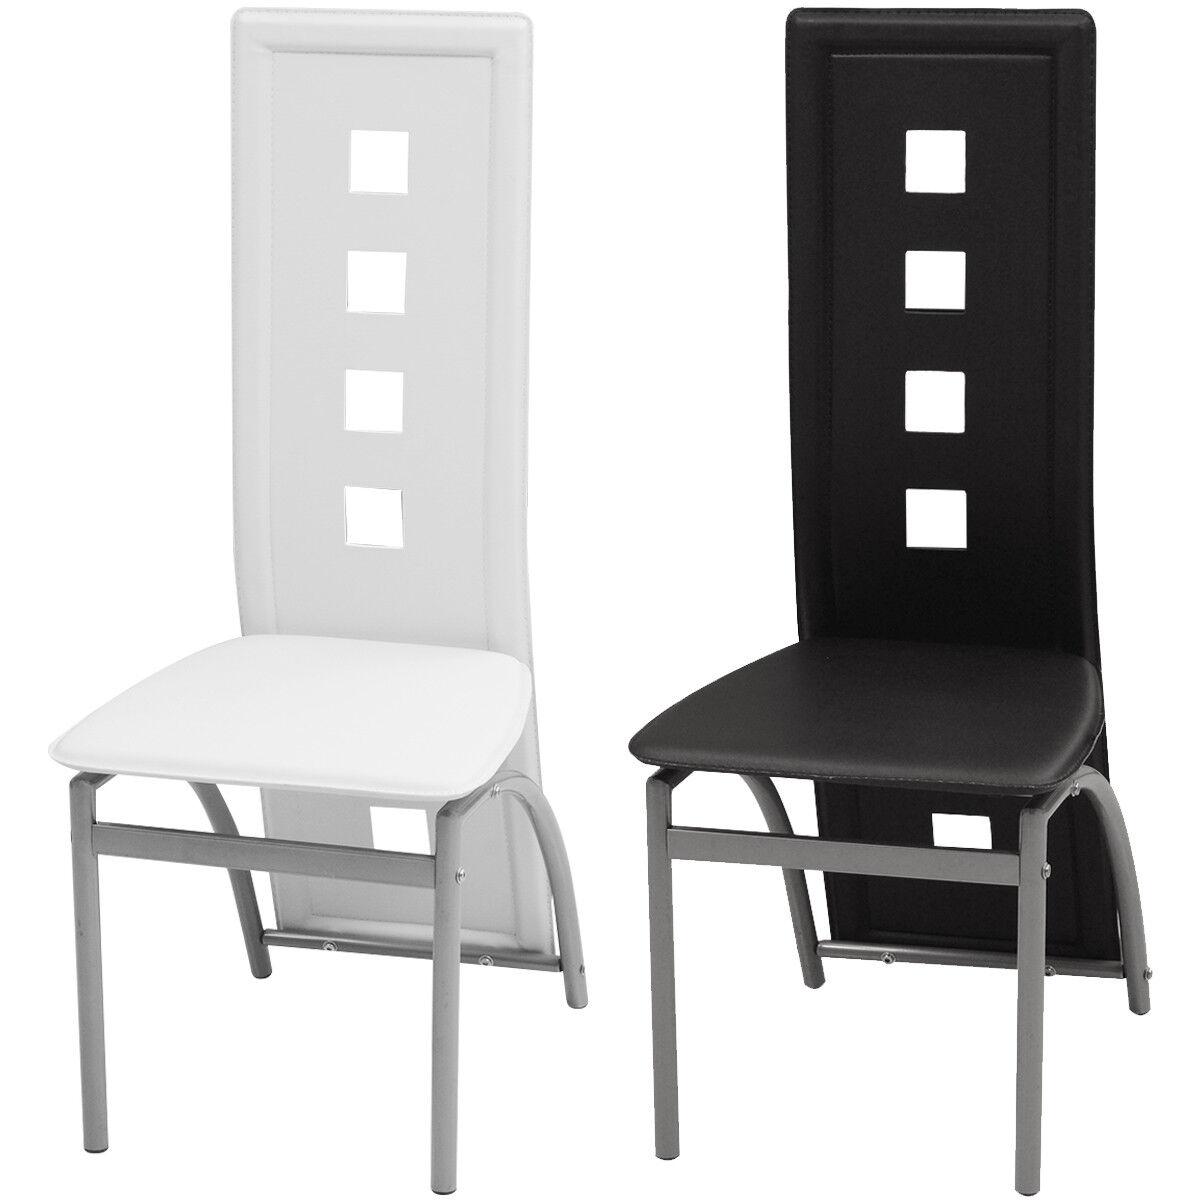 VidaXL 2 4 6x Sillas de Salón Comedor Modernas Cuero Artifical Negro blancoo